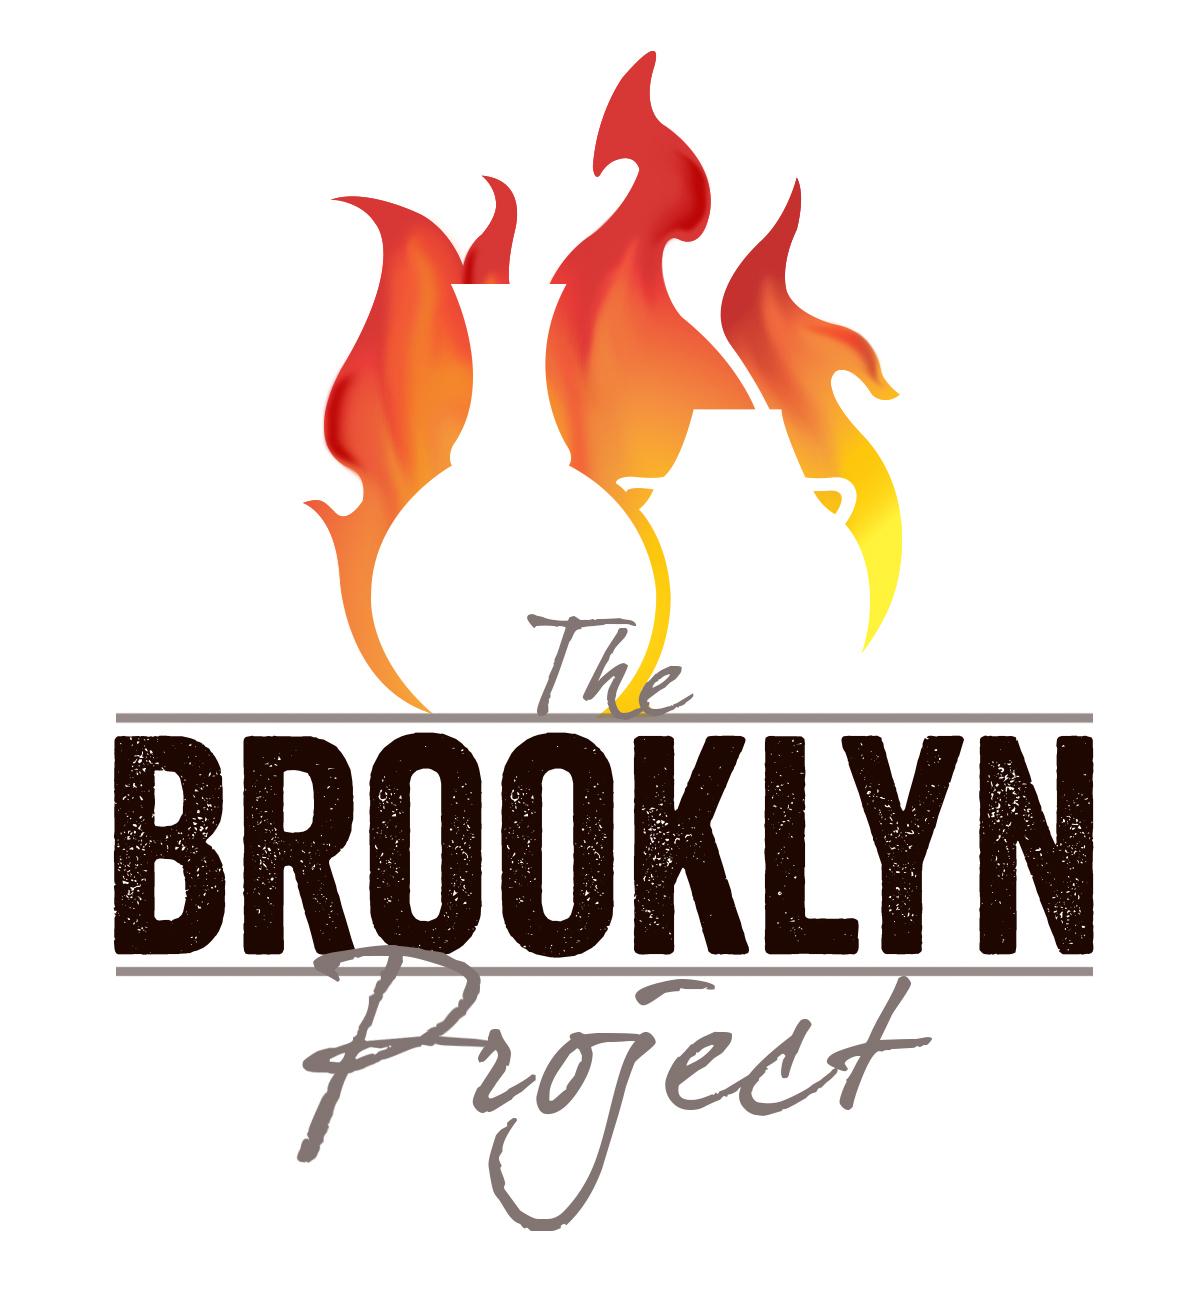 BrooklynProjectLogo.jpg